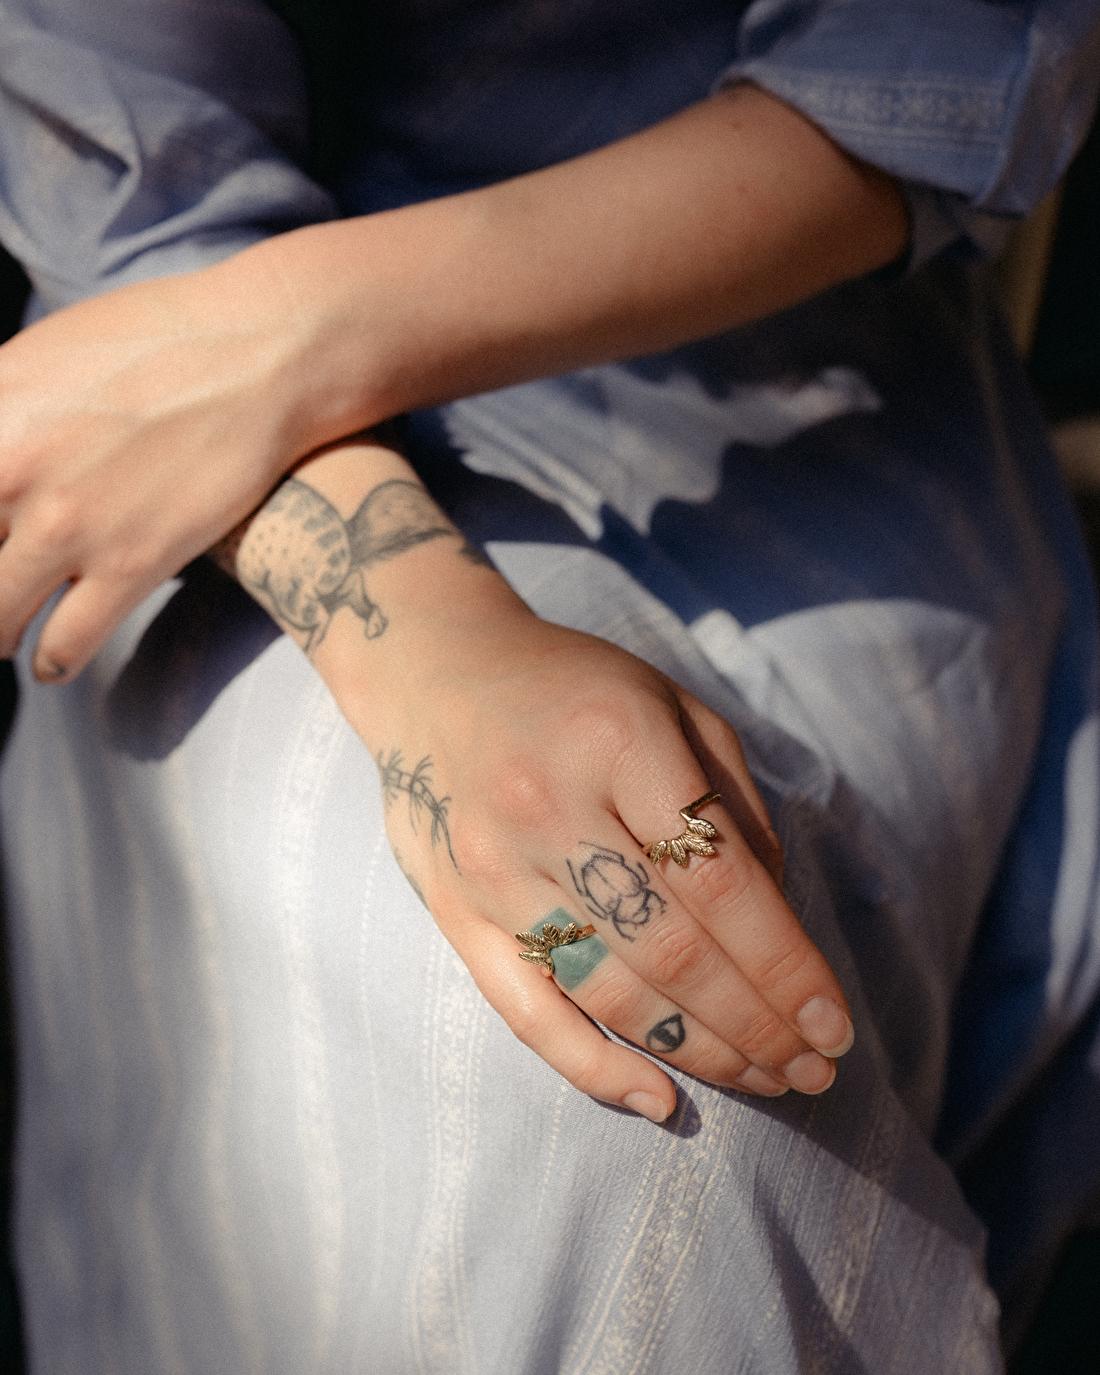 Rosa's artist hands